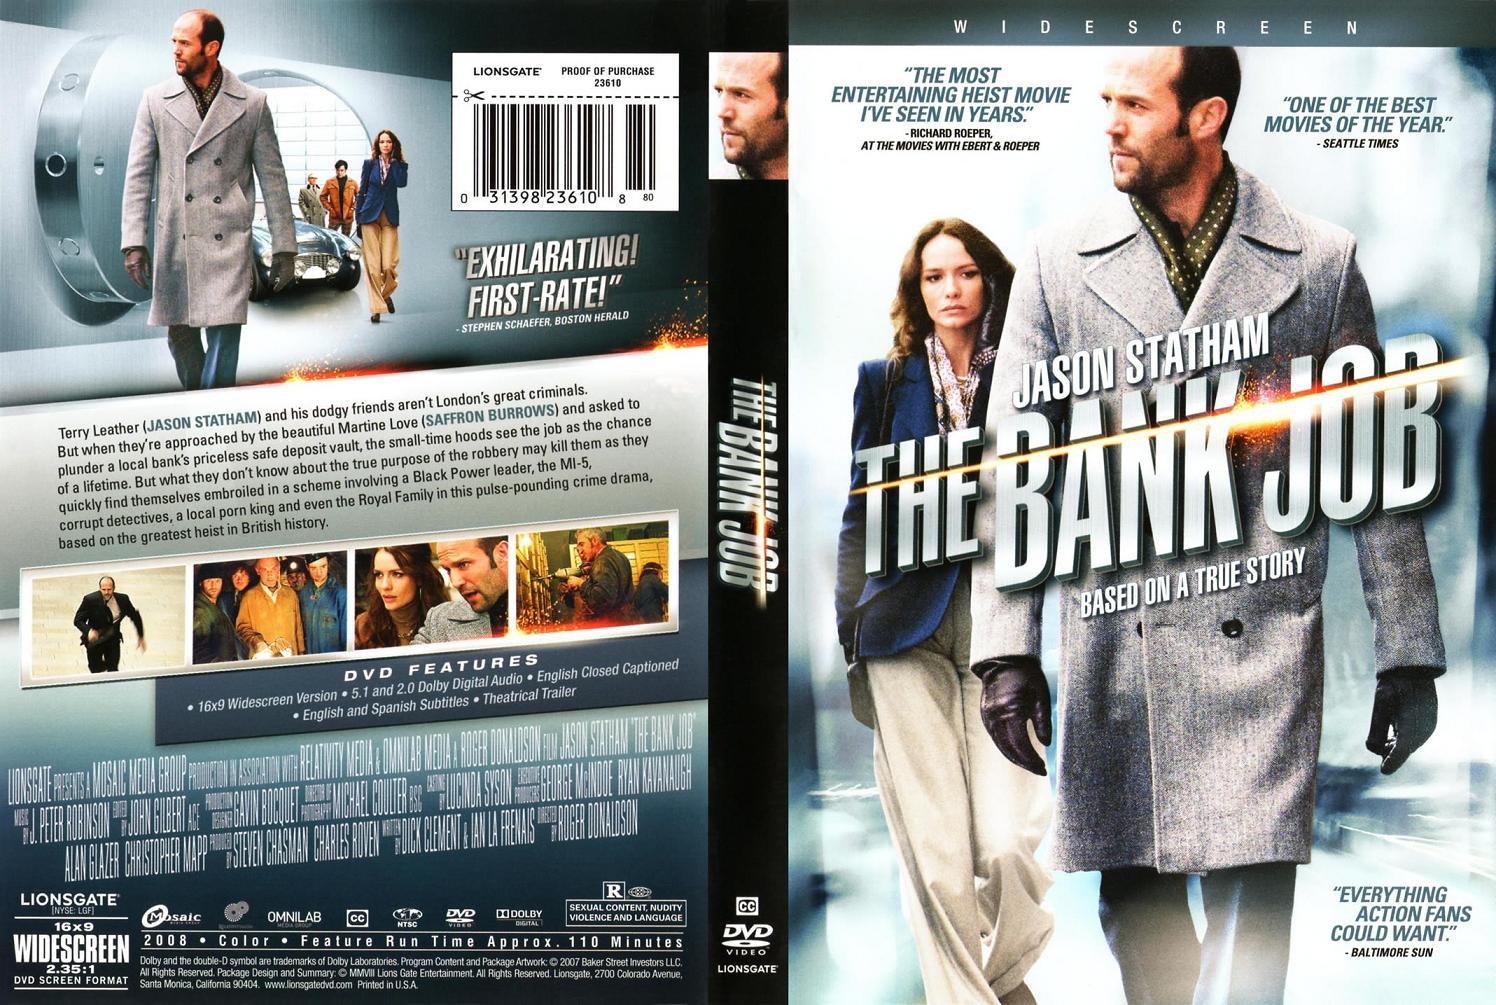 Jason statham movie collection